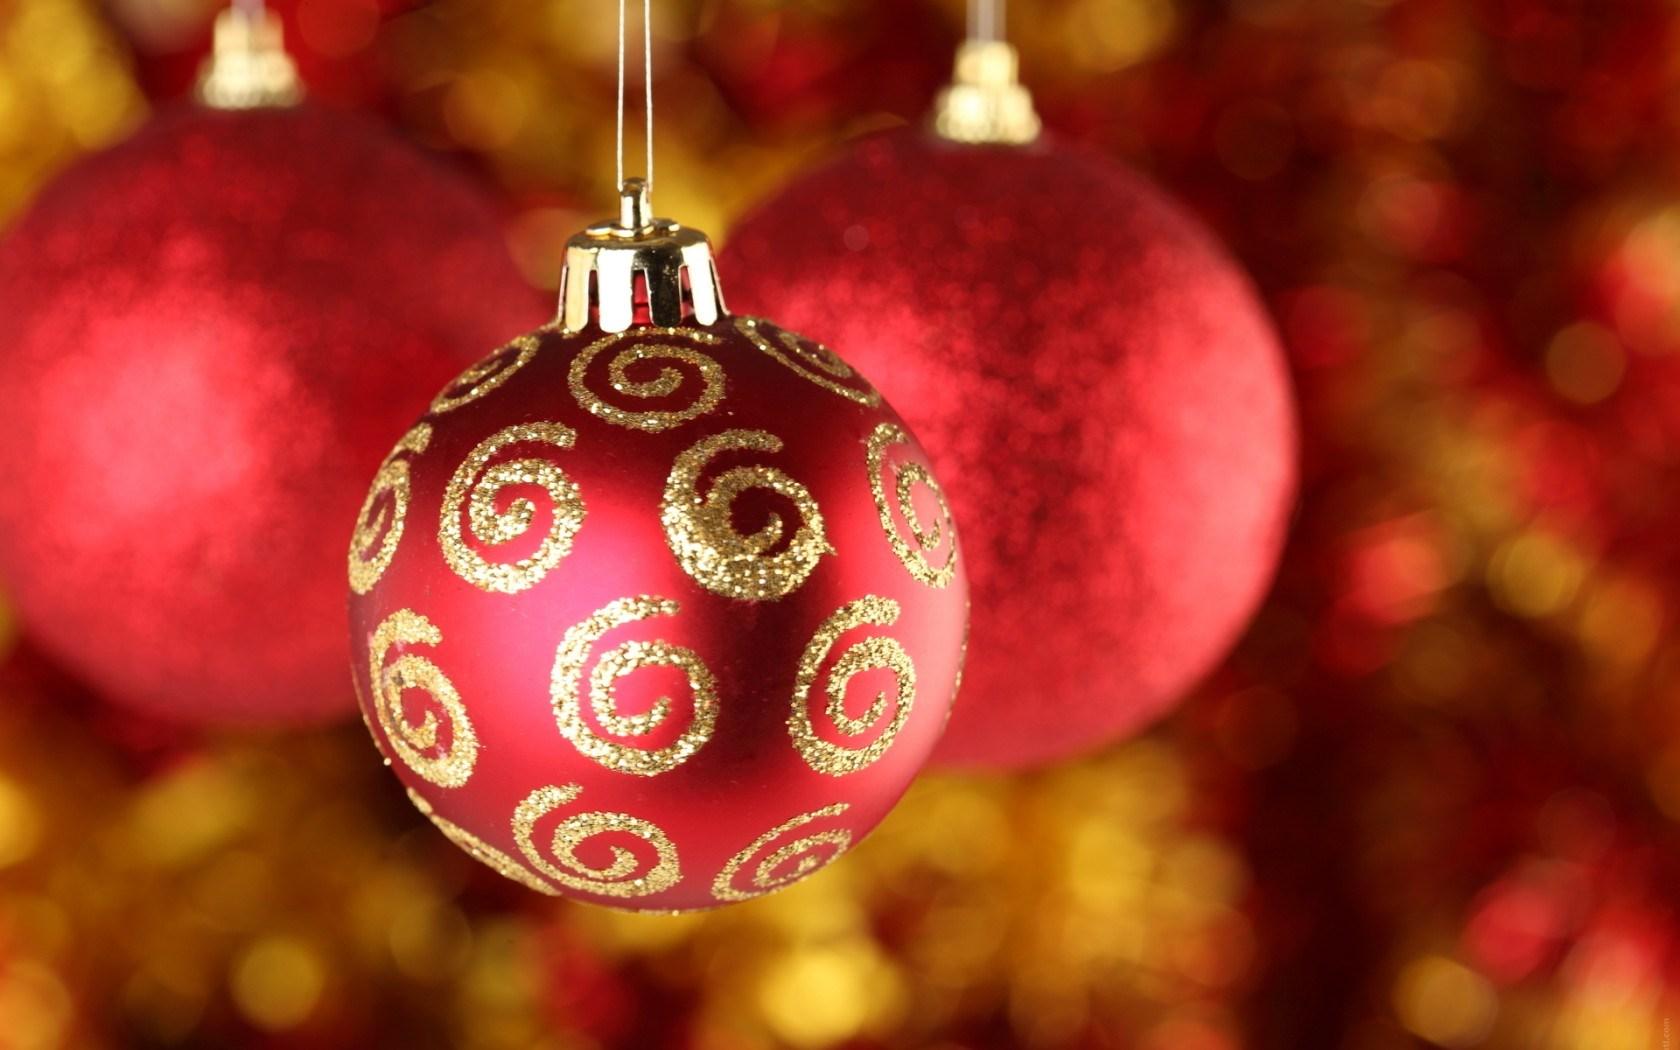 New Year Christmas Balls Ornaments